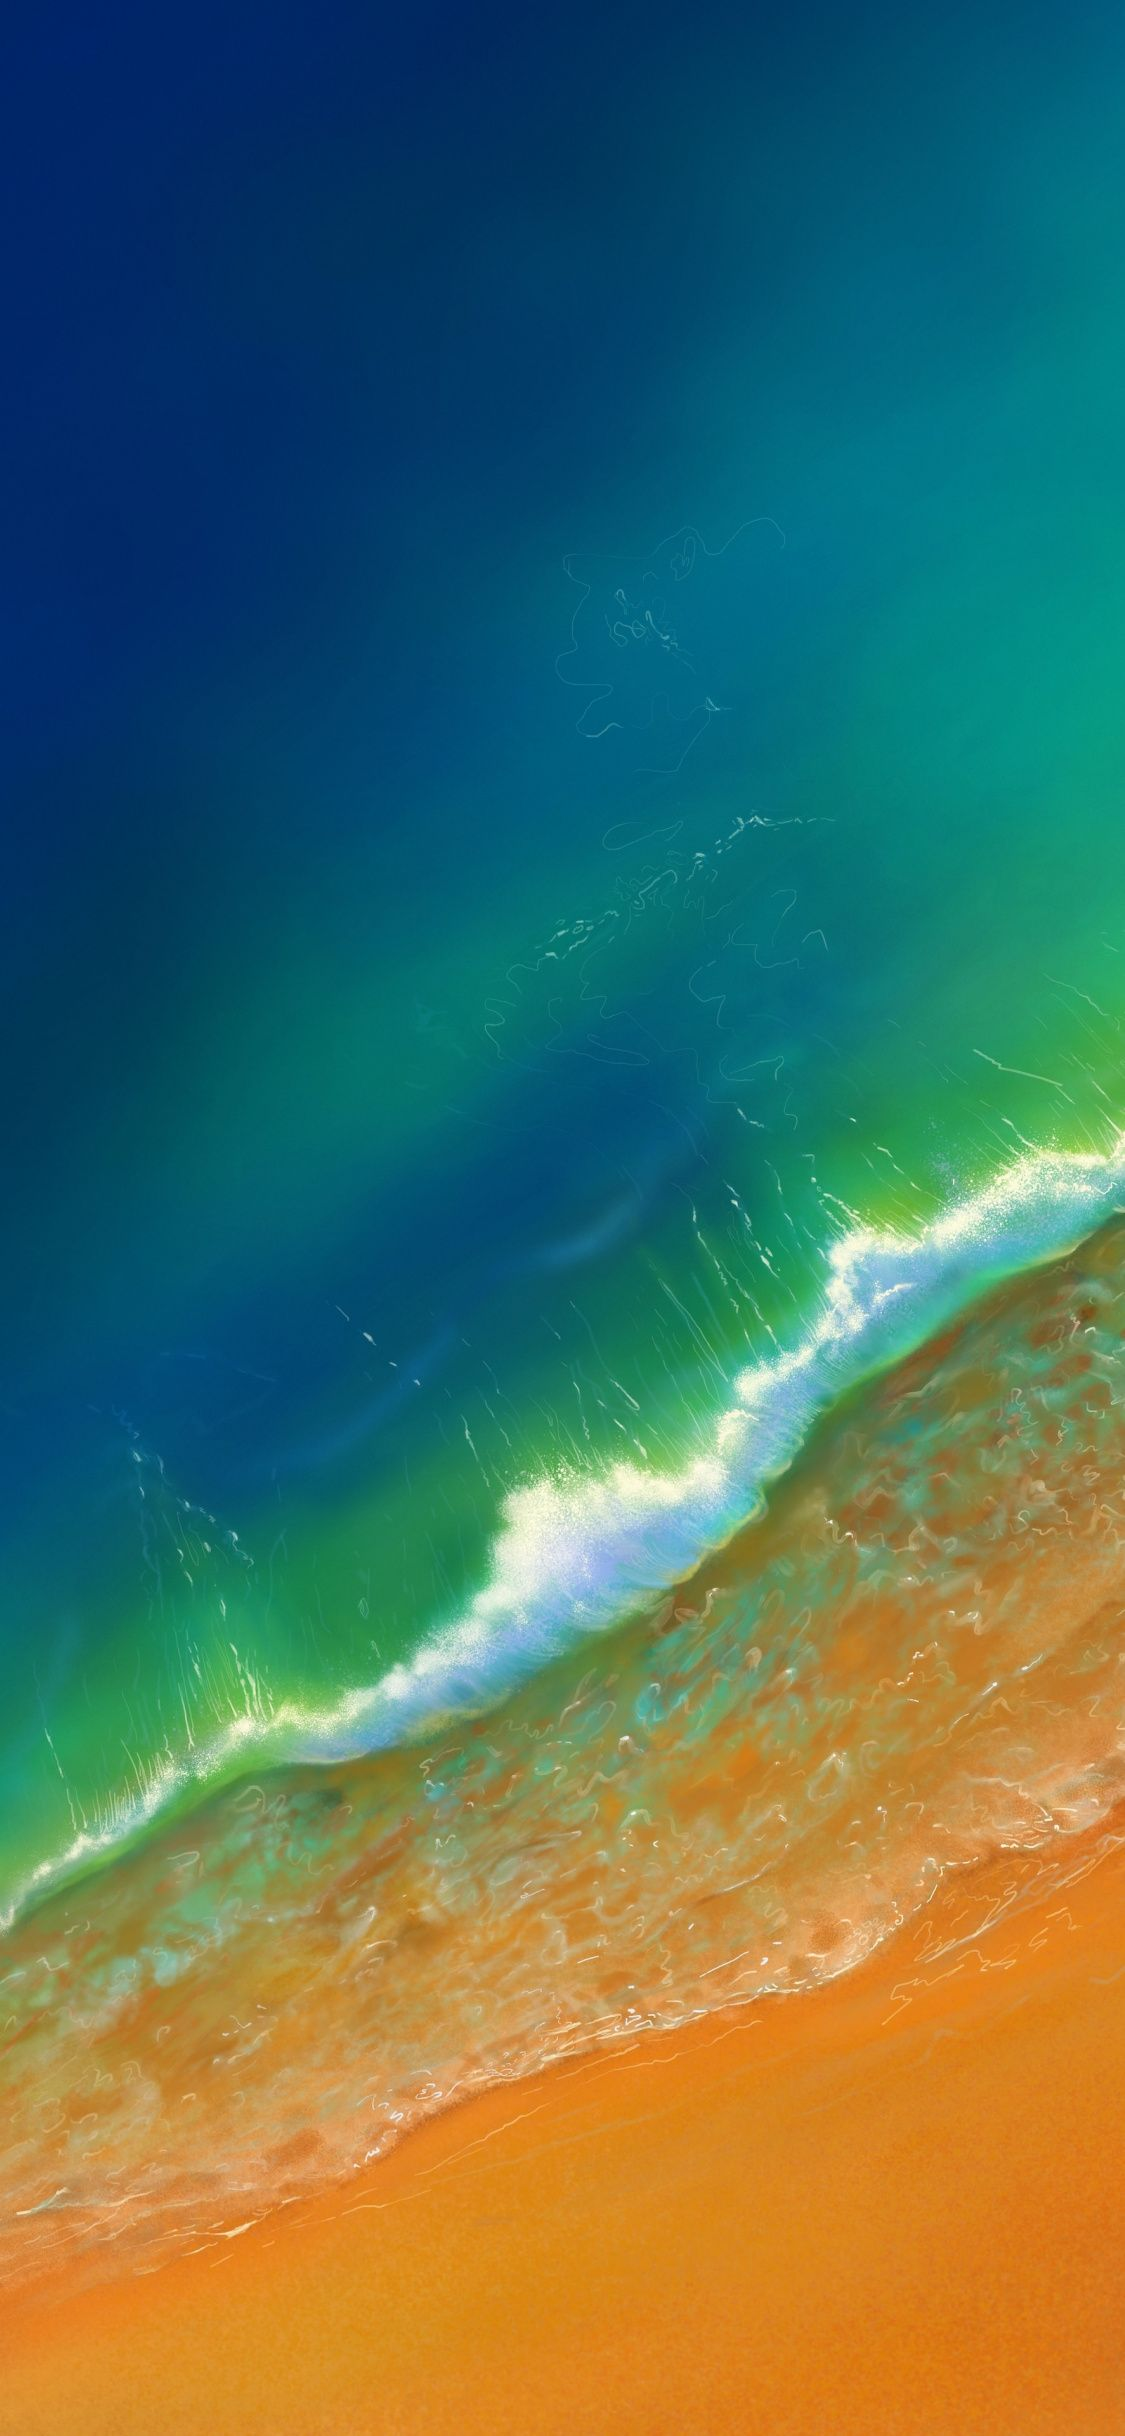 Download 1152x864 Wallpaper Green Ocean Sea Waves Aerial View Beach Iphone X 1125x2436 Hd Image Backgrou Ocean Wallpaper Beach Phone Wallpaper Green Ocean